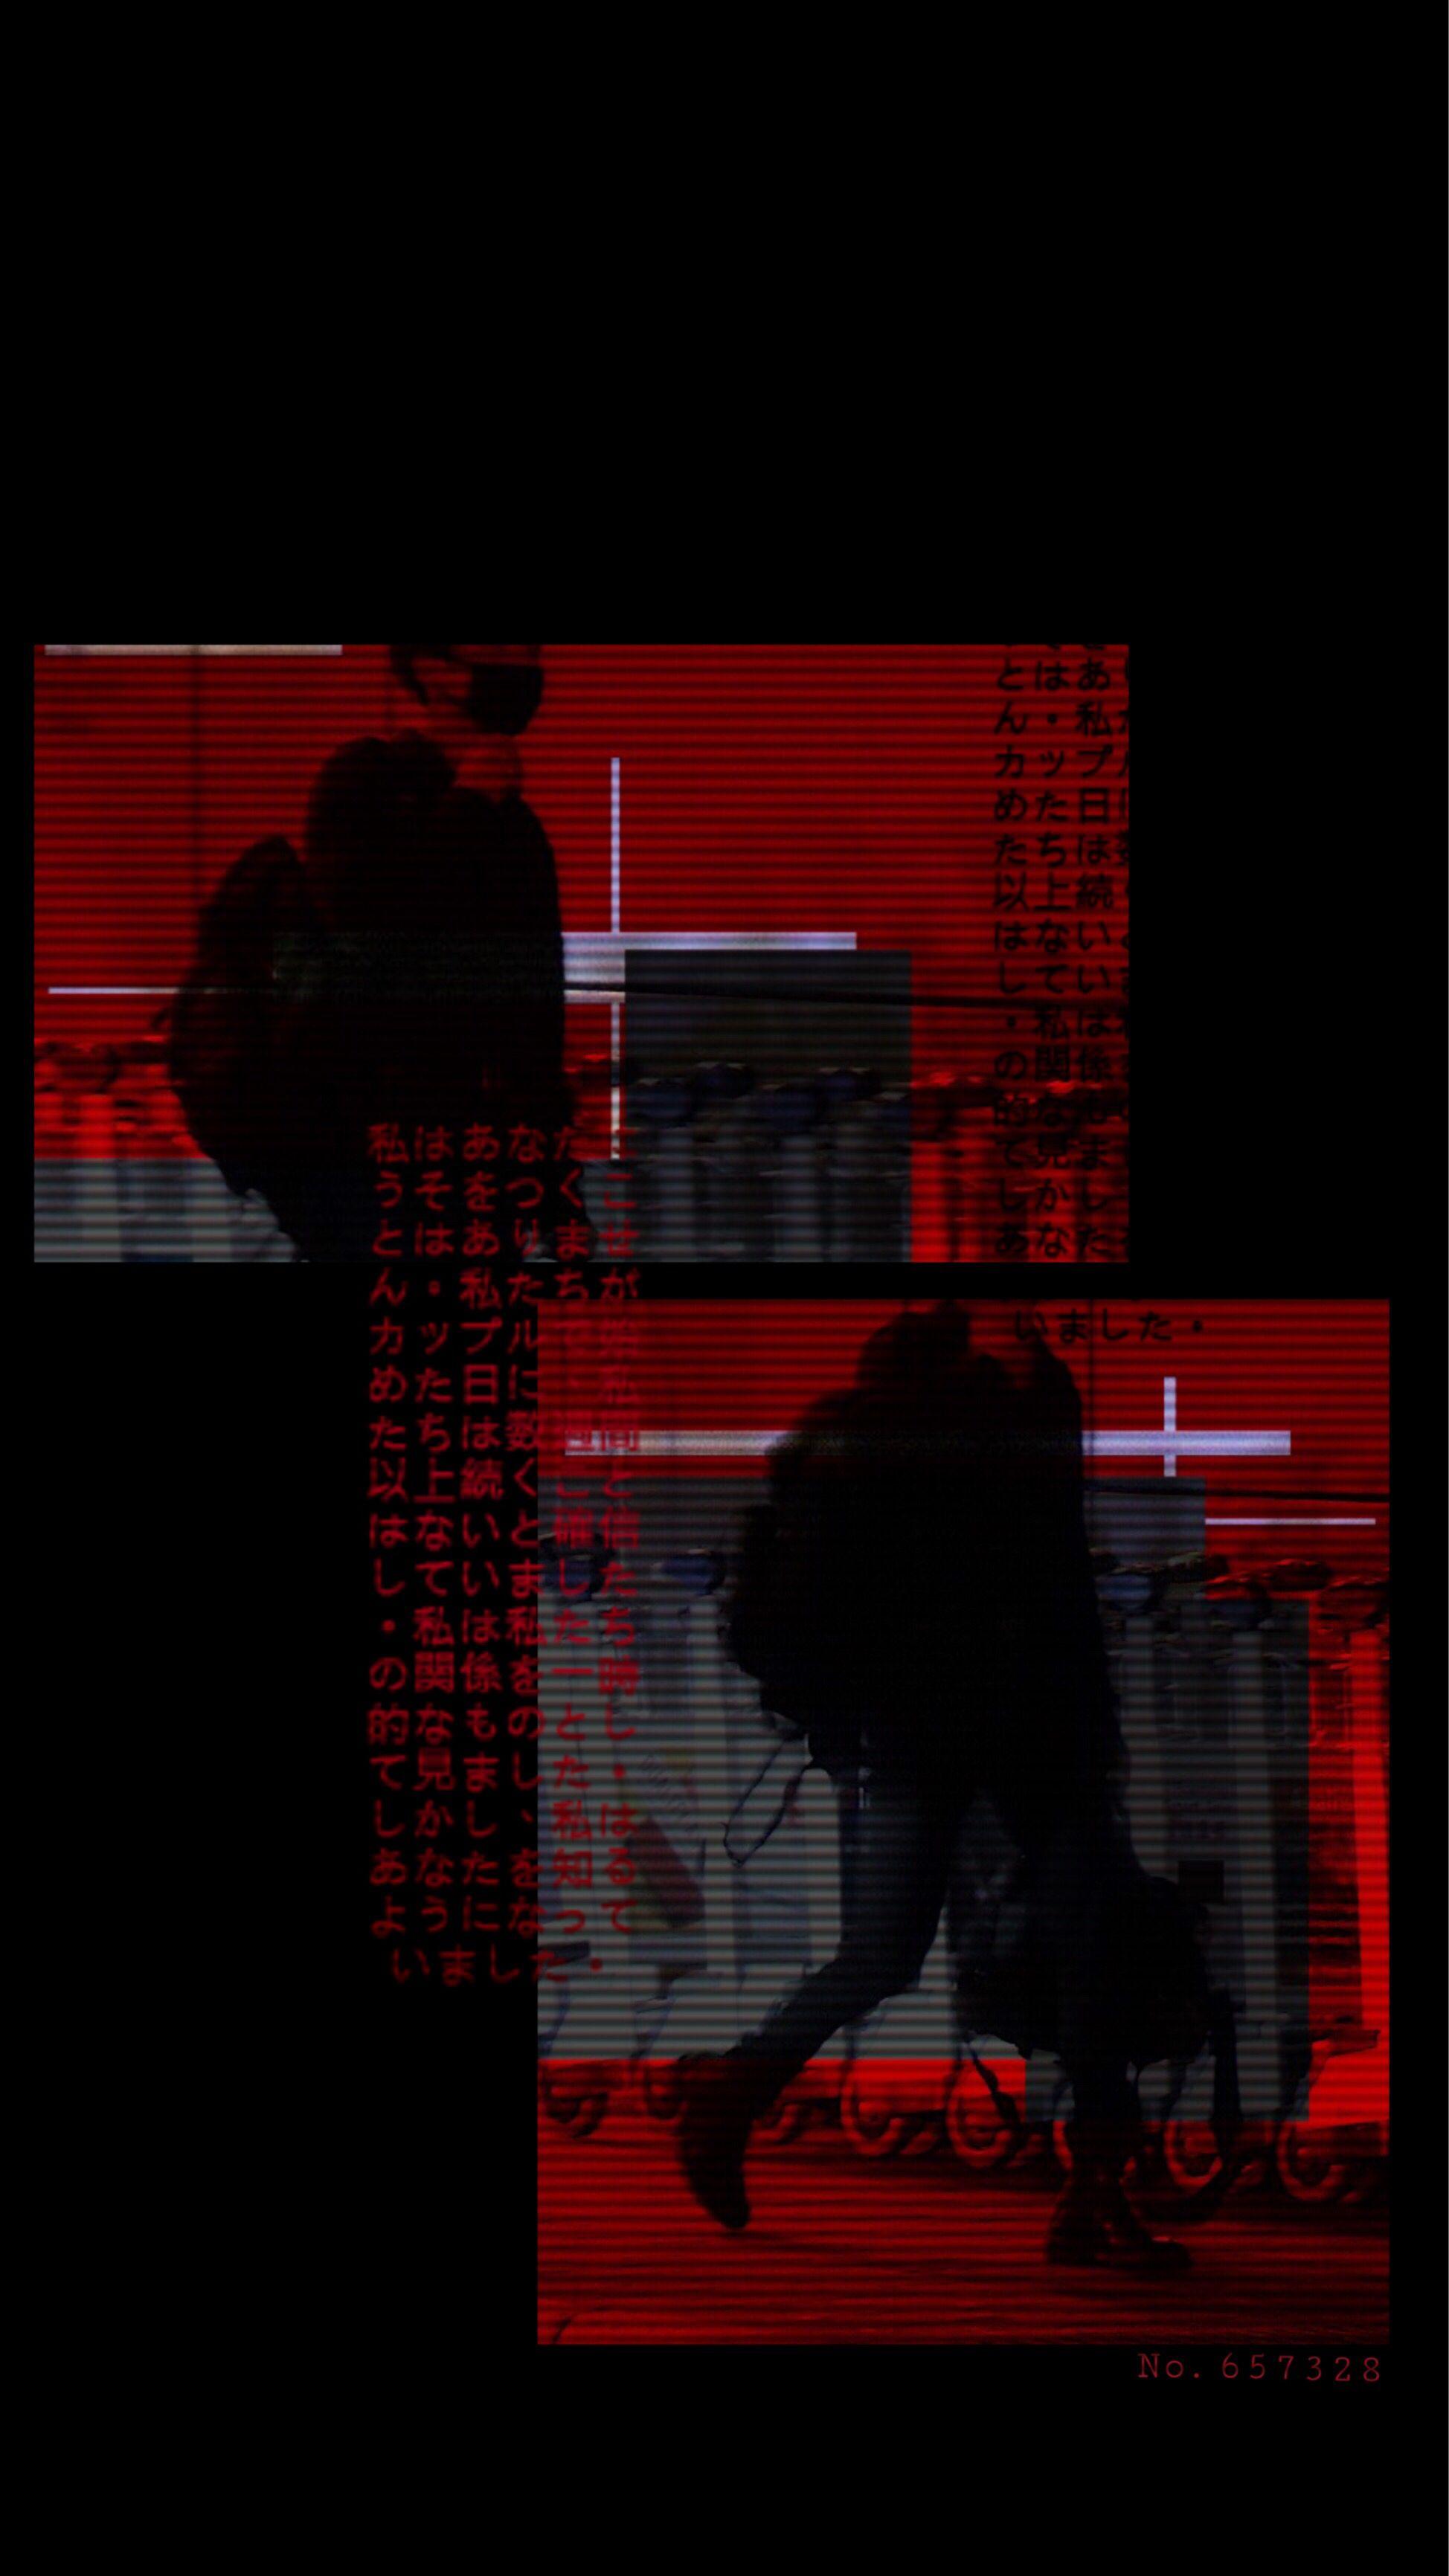 Jeon Jungkook Lockscreen Edgy Wallpaper Black Aesthetic Wallpaper Bts Aesthetic Pictures